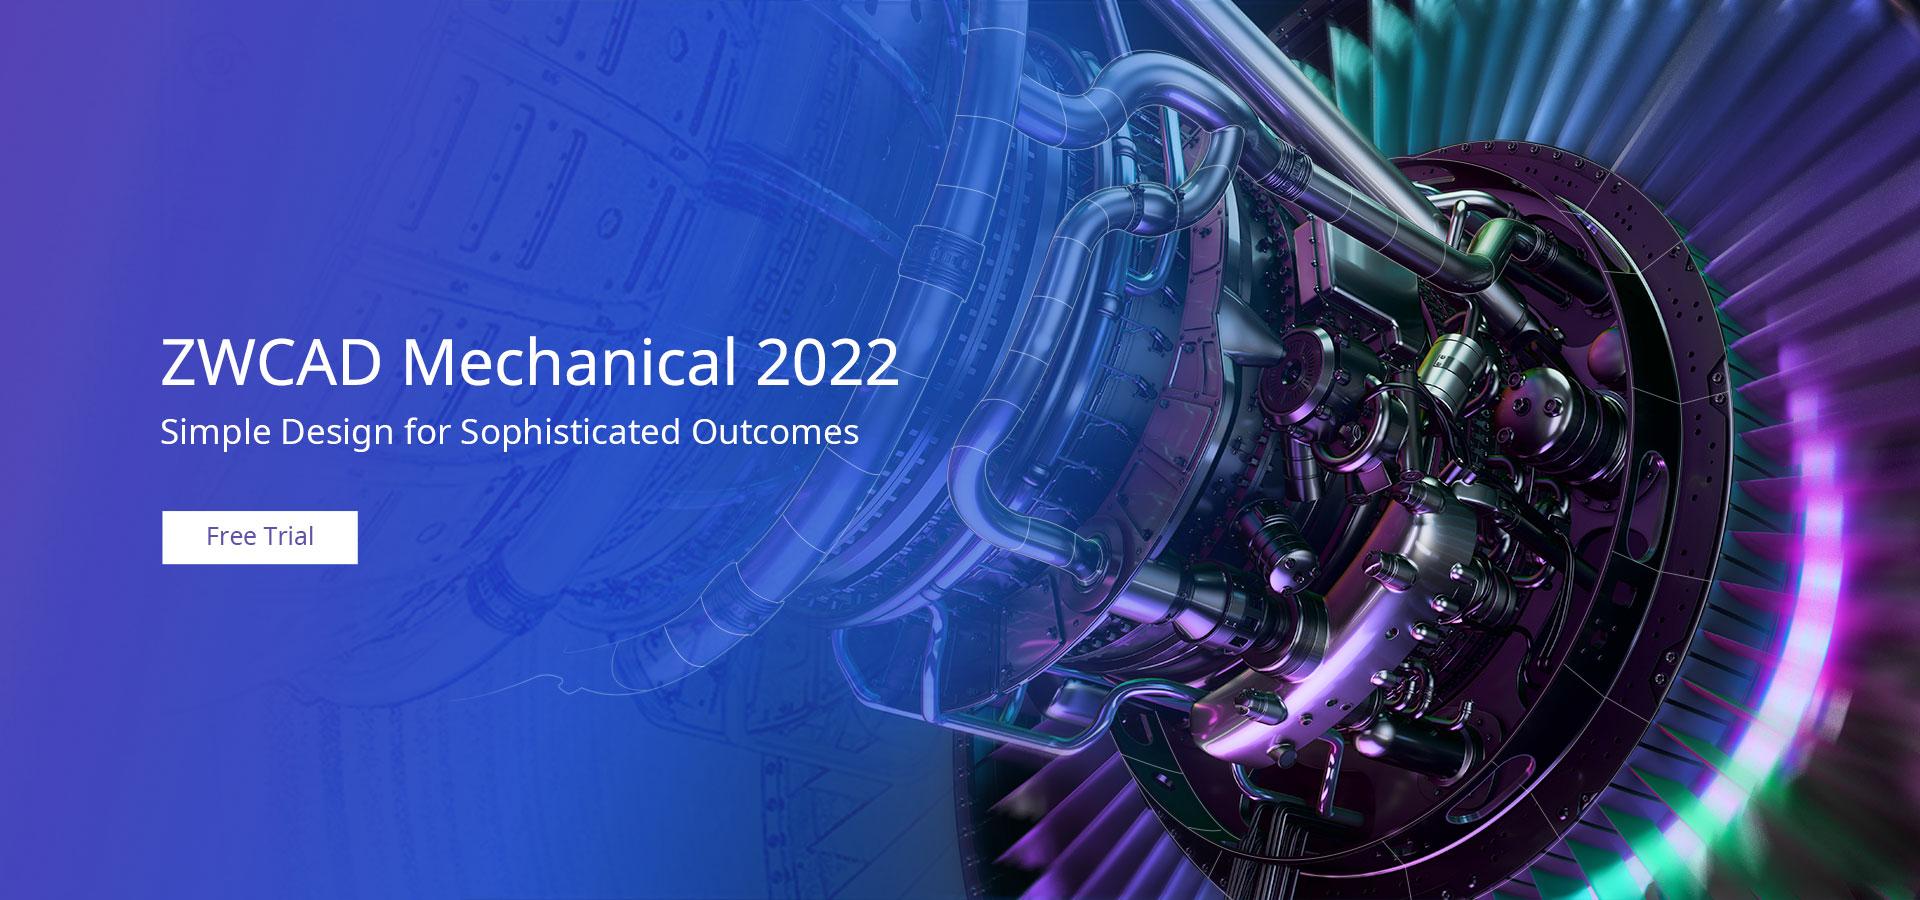 ZWCAD Mechanical 2022